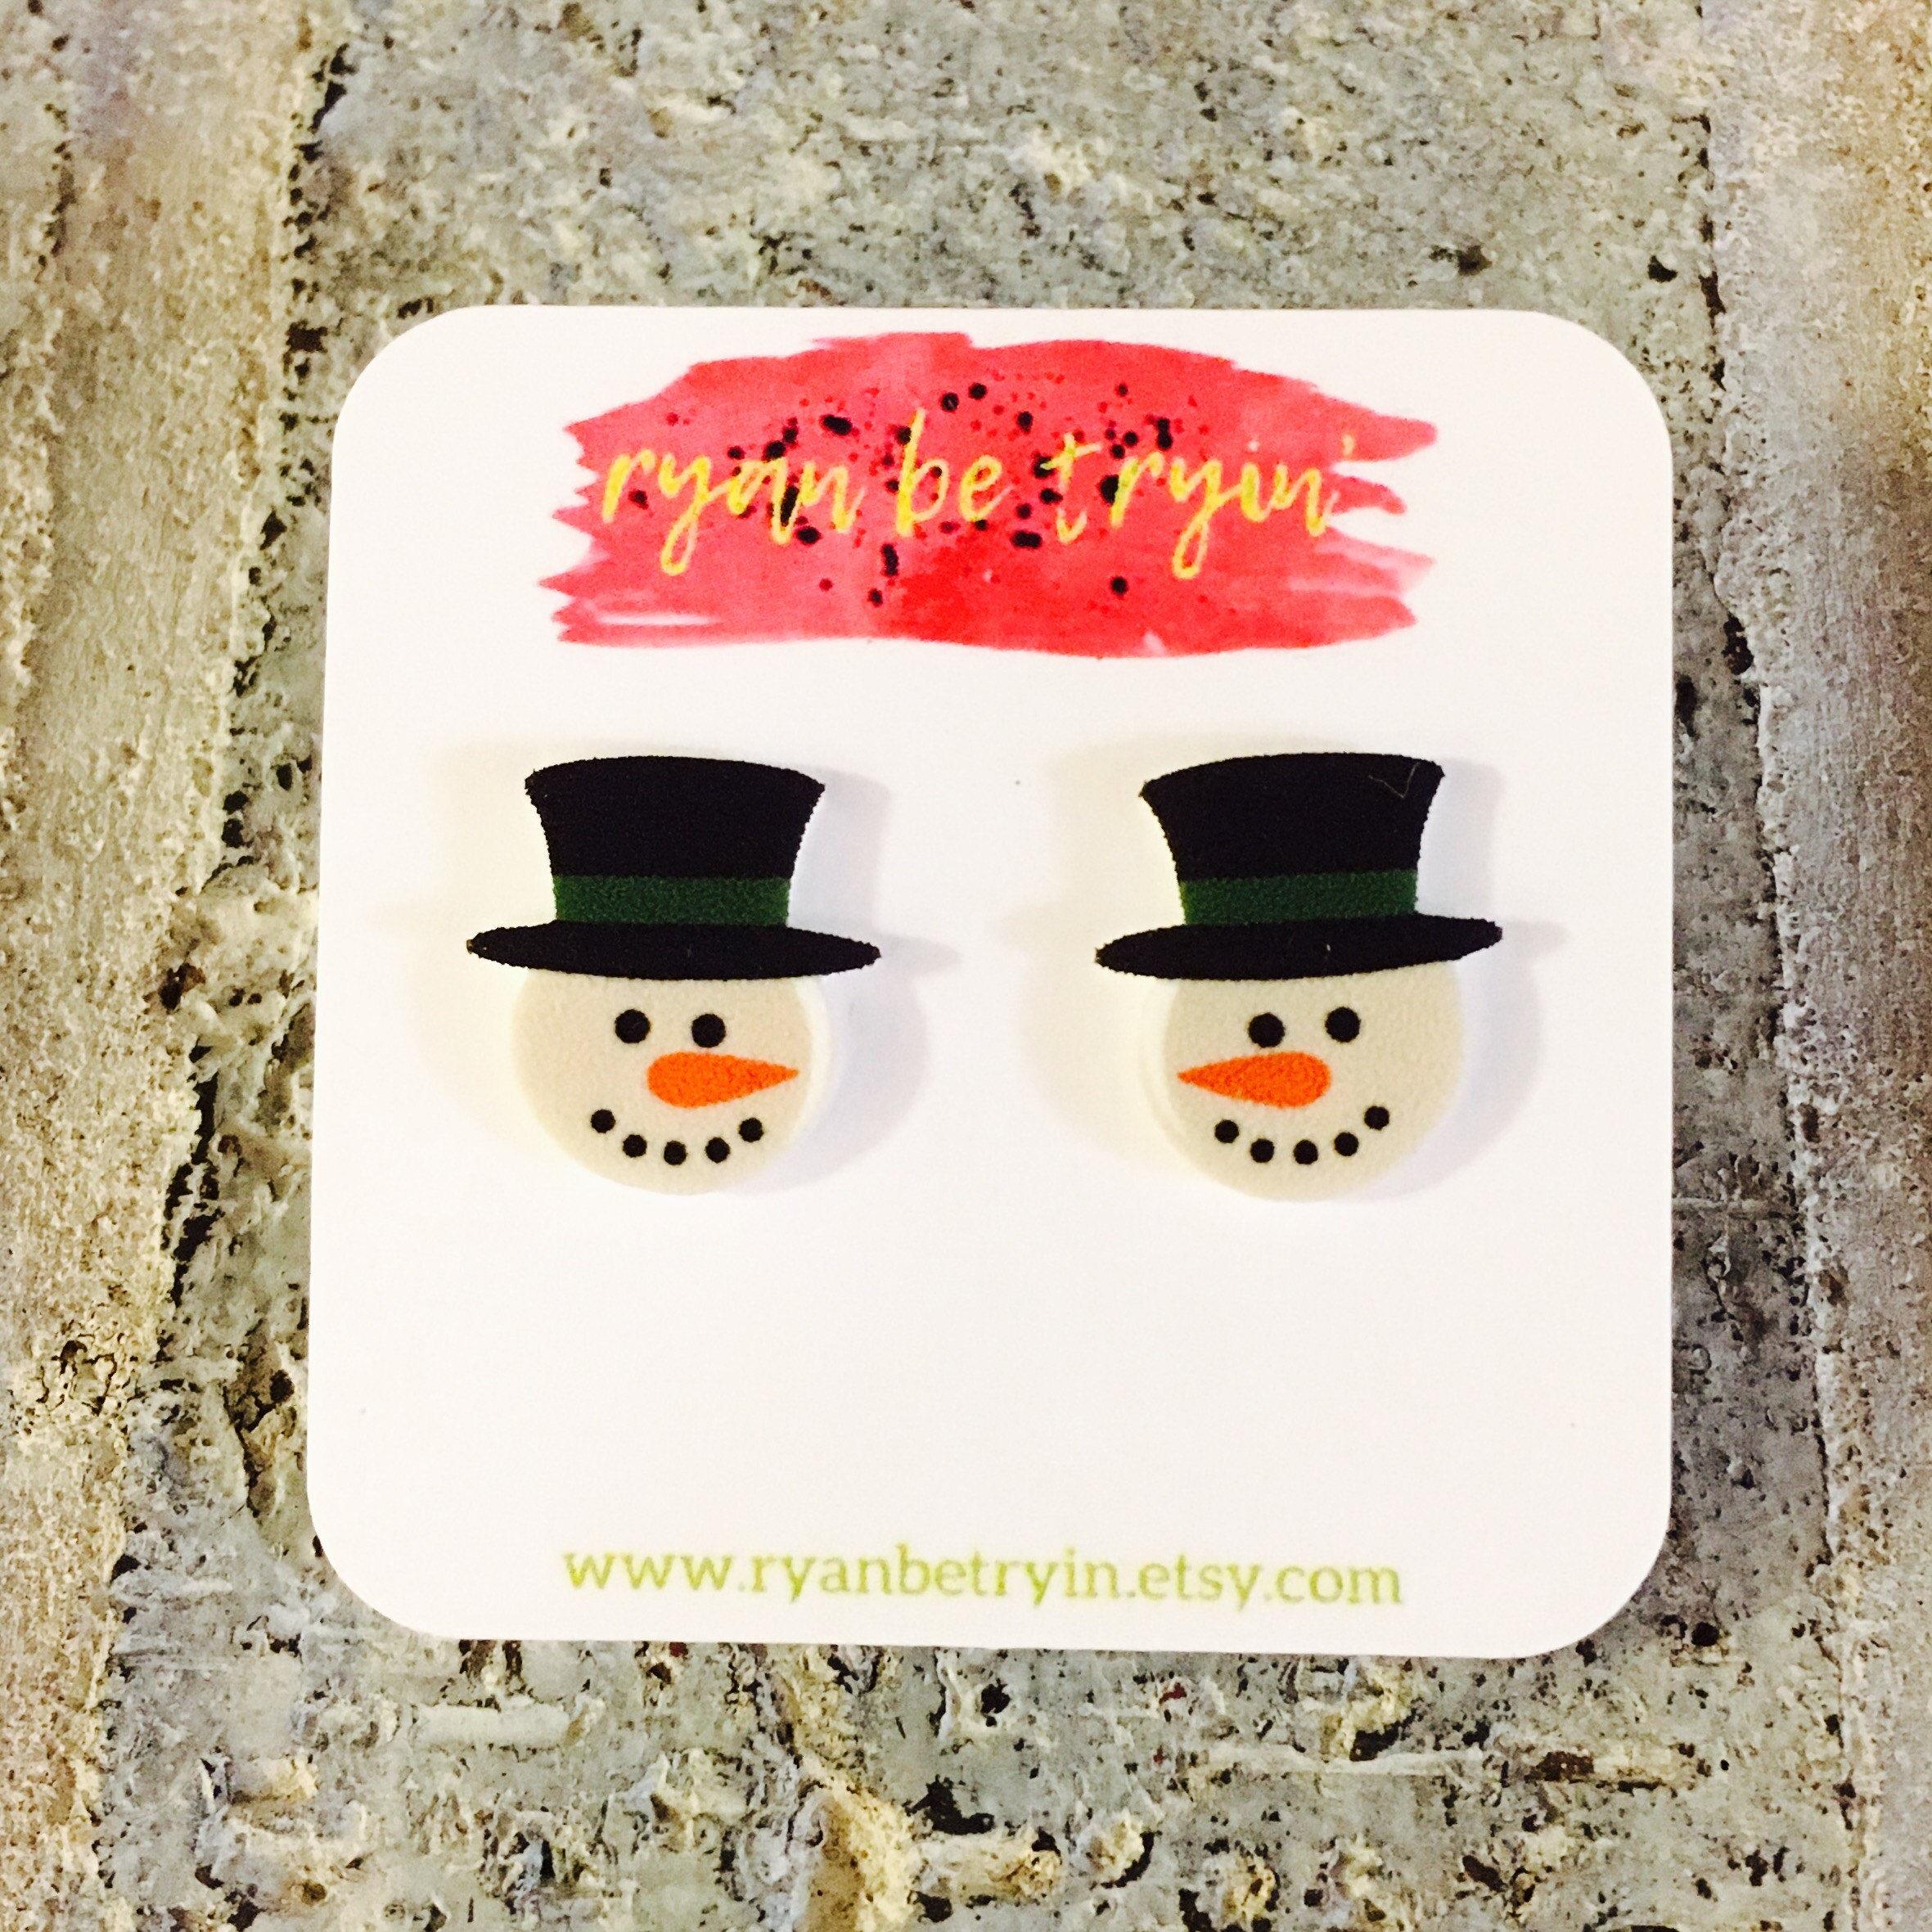 Christmas Earrings Snowman Earrings Christmas Accessories | Etsy